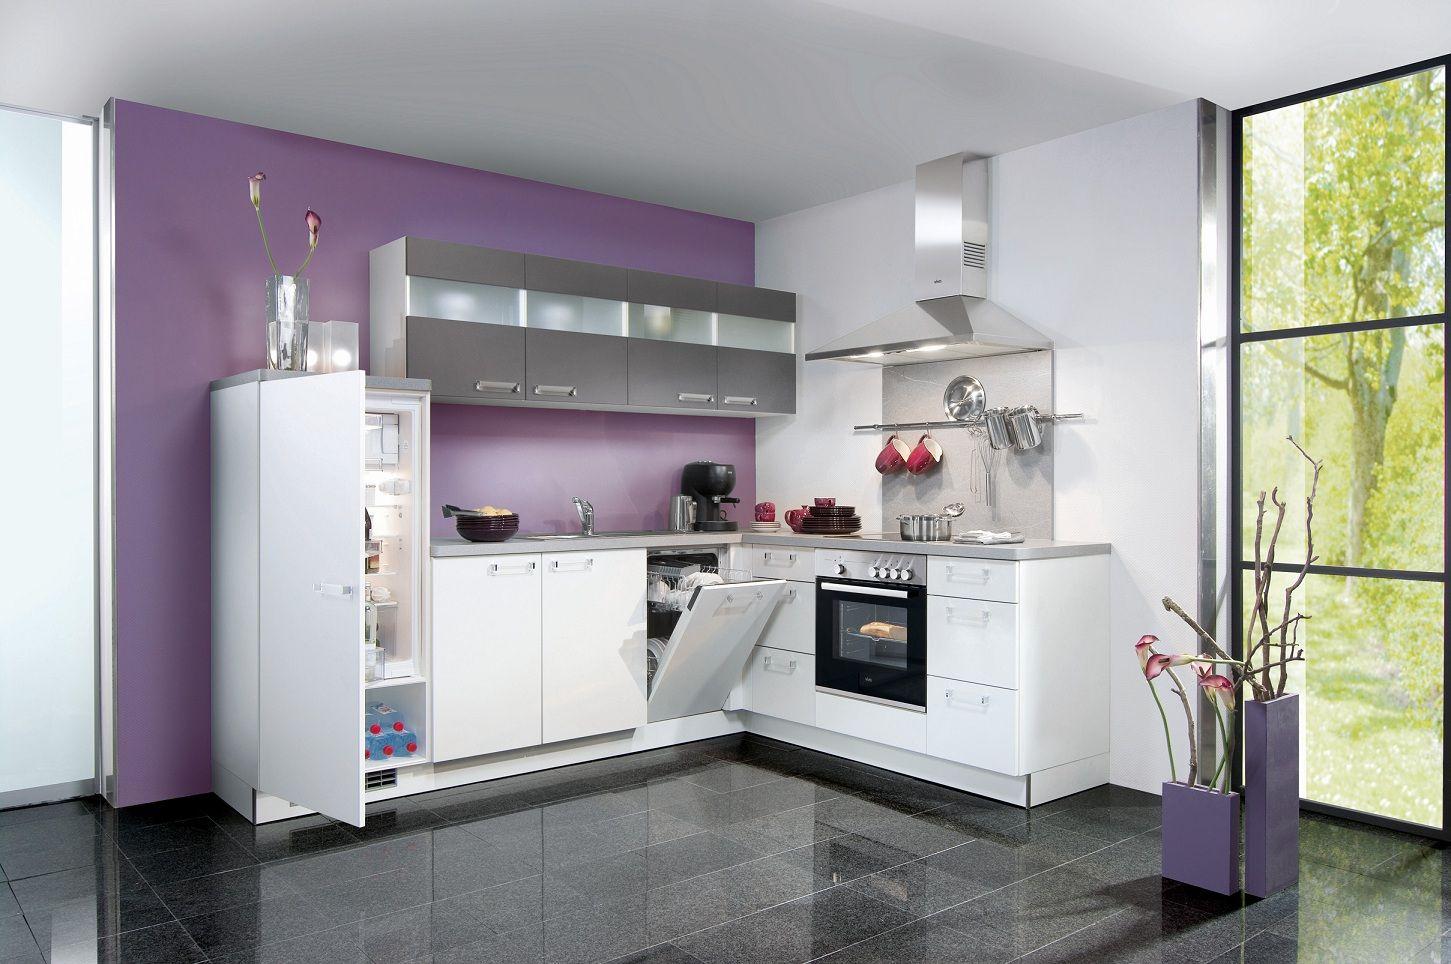 Küchenstudio Fellbach kuechen paradies com nolte küchen küchen paradies fellbach